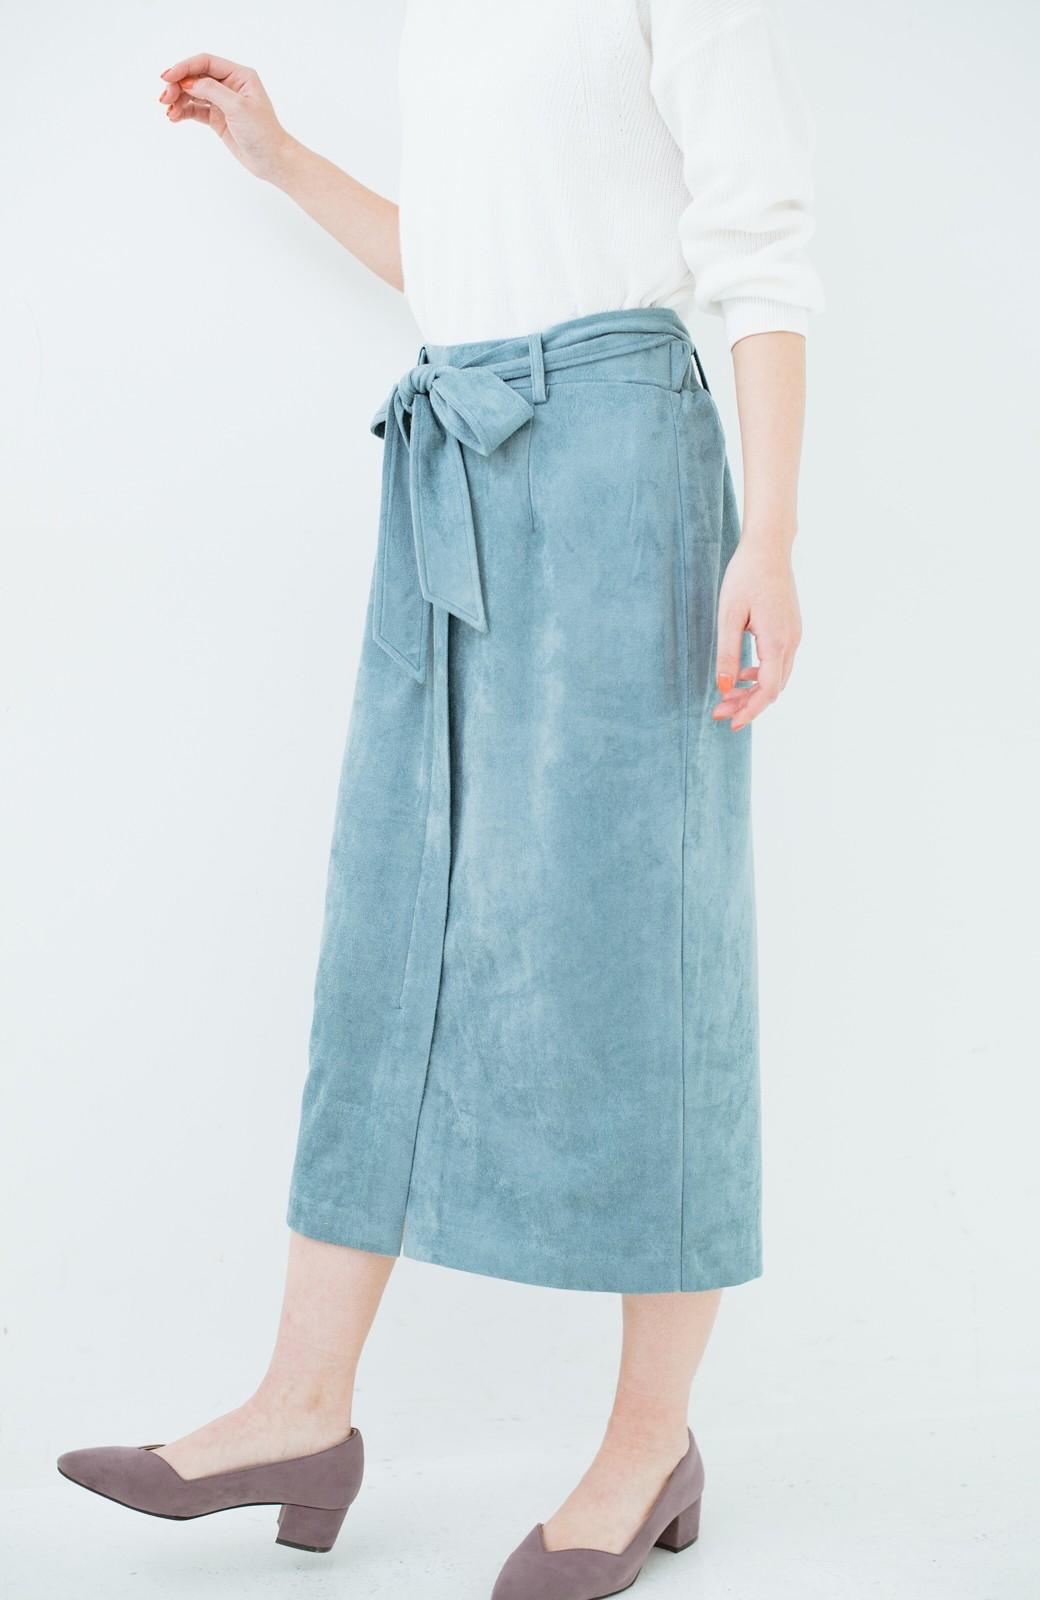 haco! 大人が安心して着られるタイトスカート by que made me <グレイッシュブルー>の商品写真5